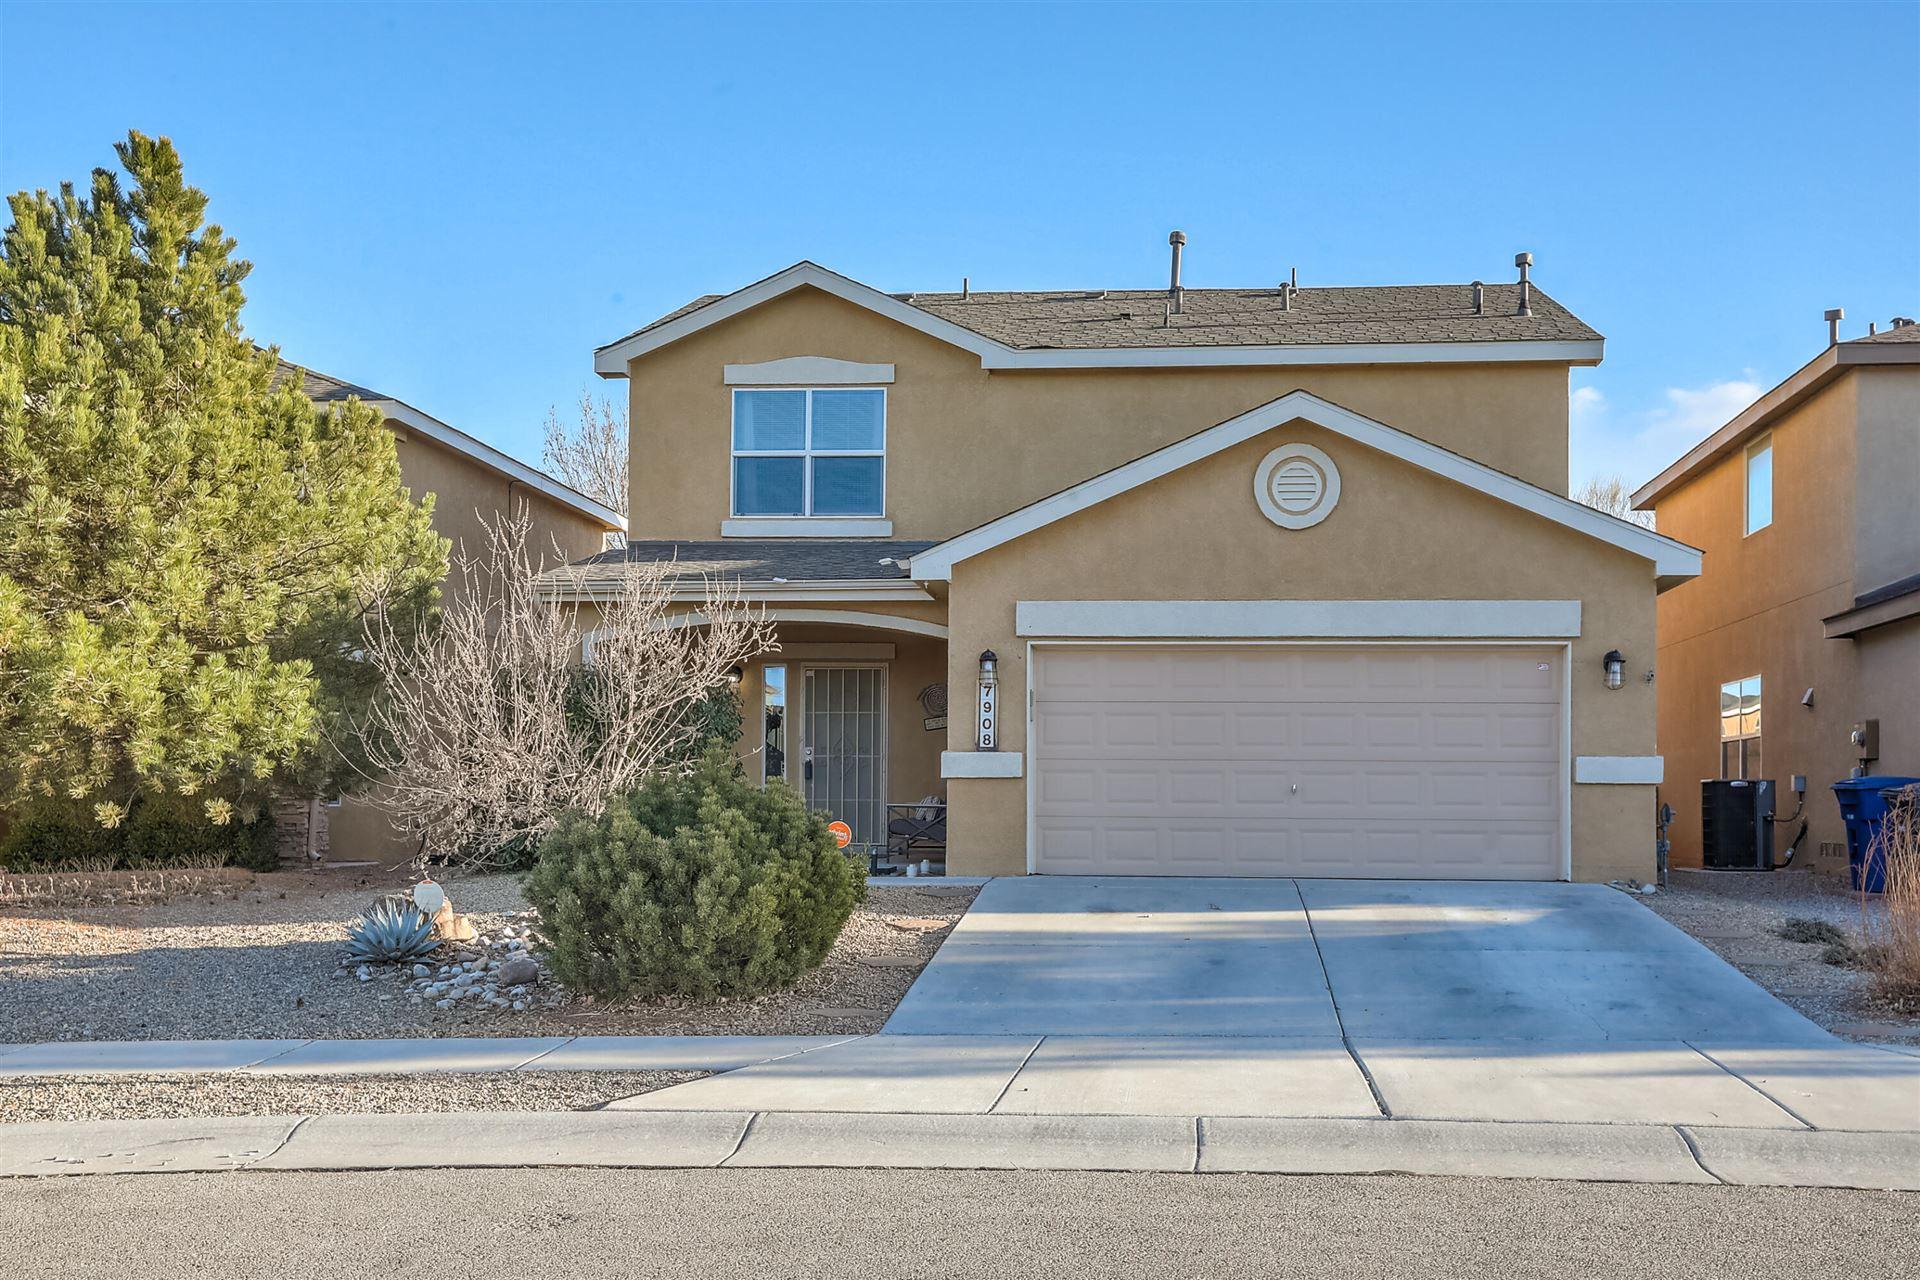 7908 Sierra Altos Place NW, Albuquerque, NM 87114 - MLS#: 987080